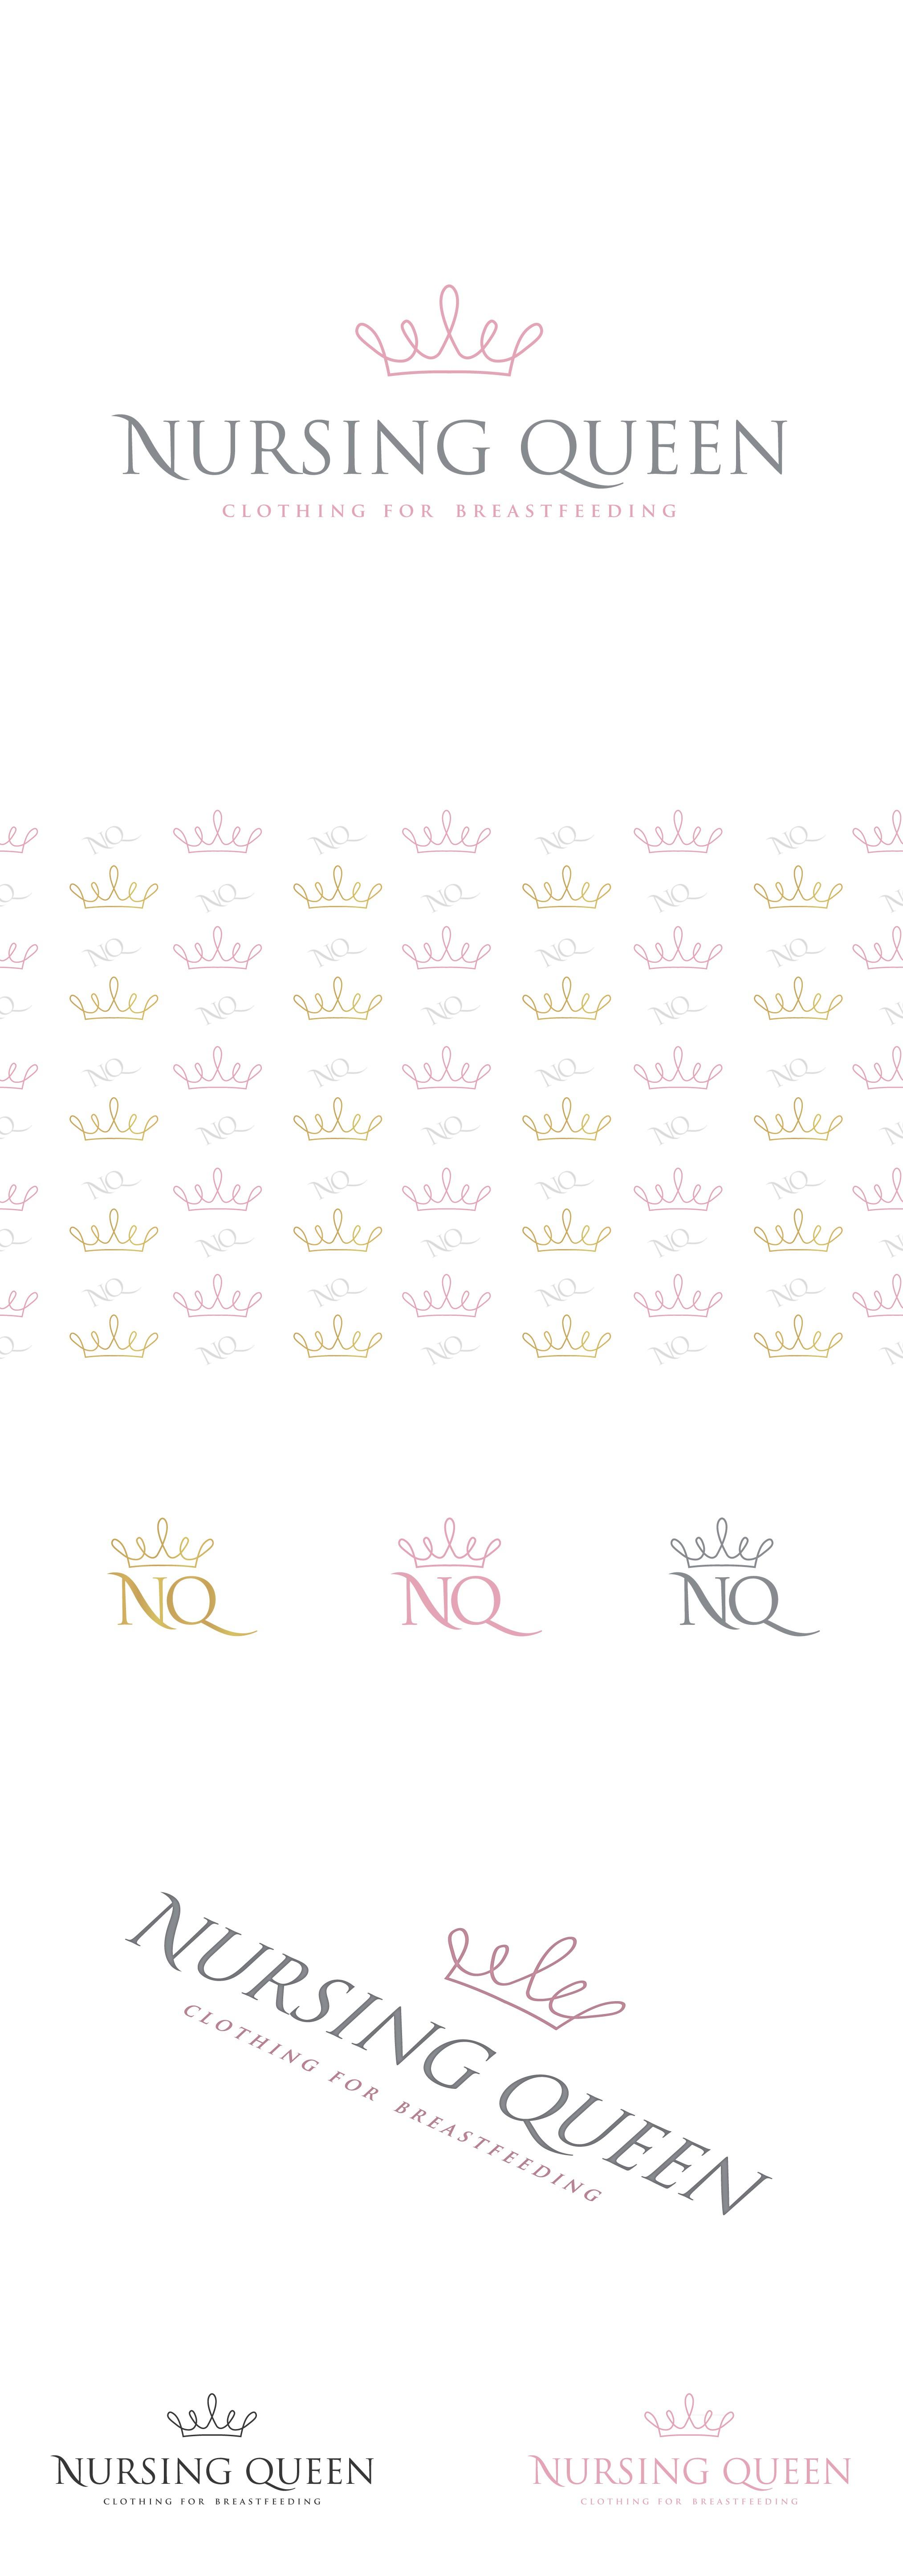 Create a pretty/classy logo for Nursing Queen: clothing for breastfeeding